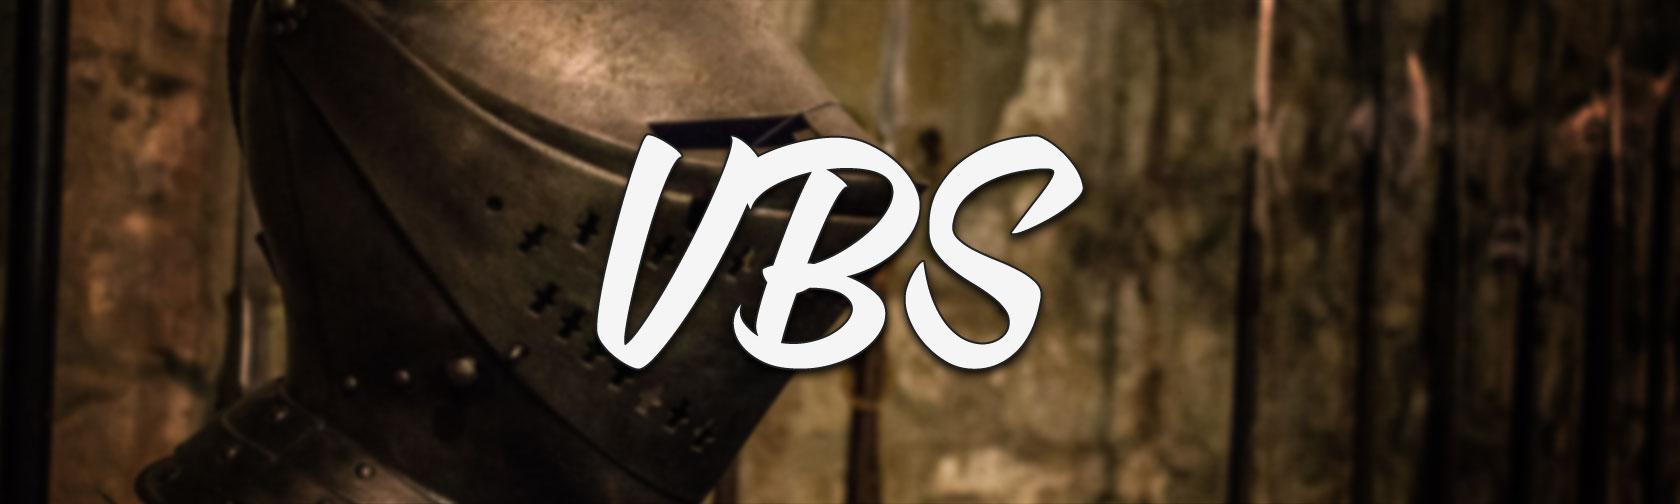 VBS Page Header